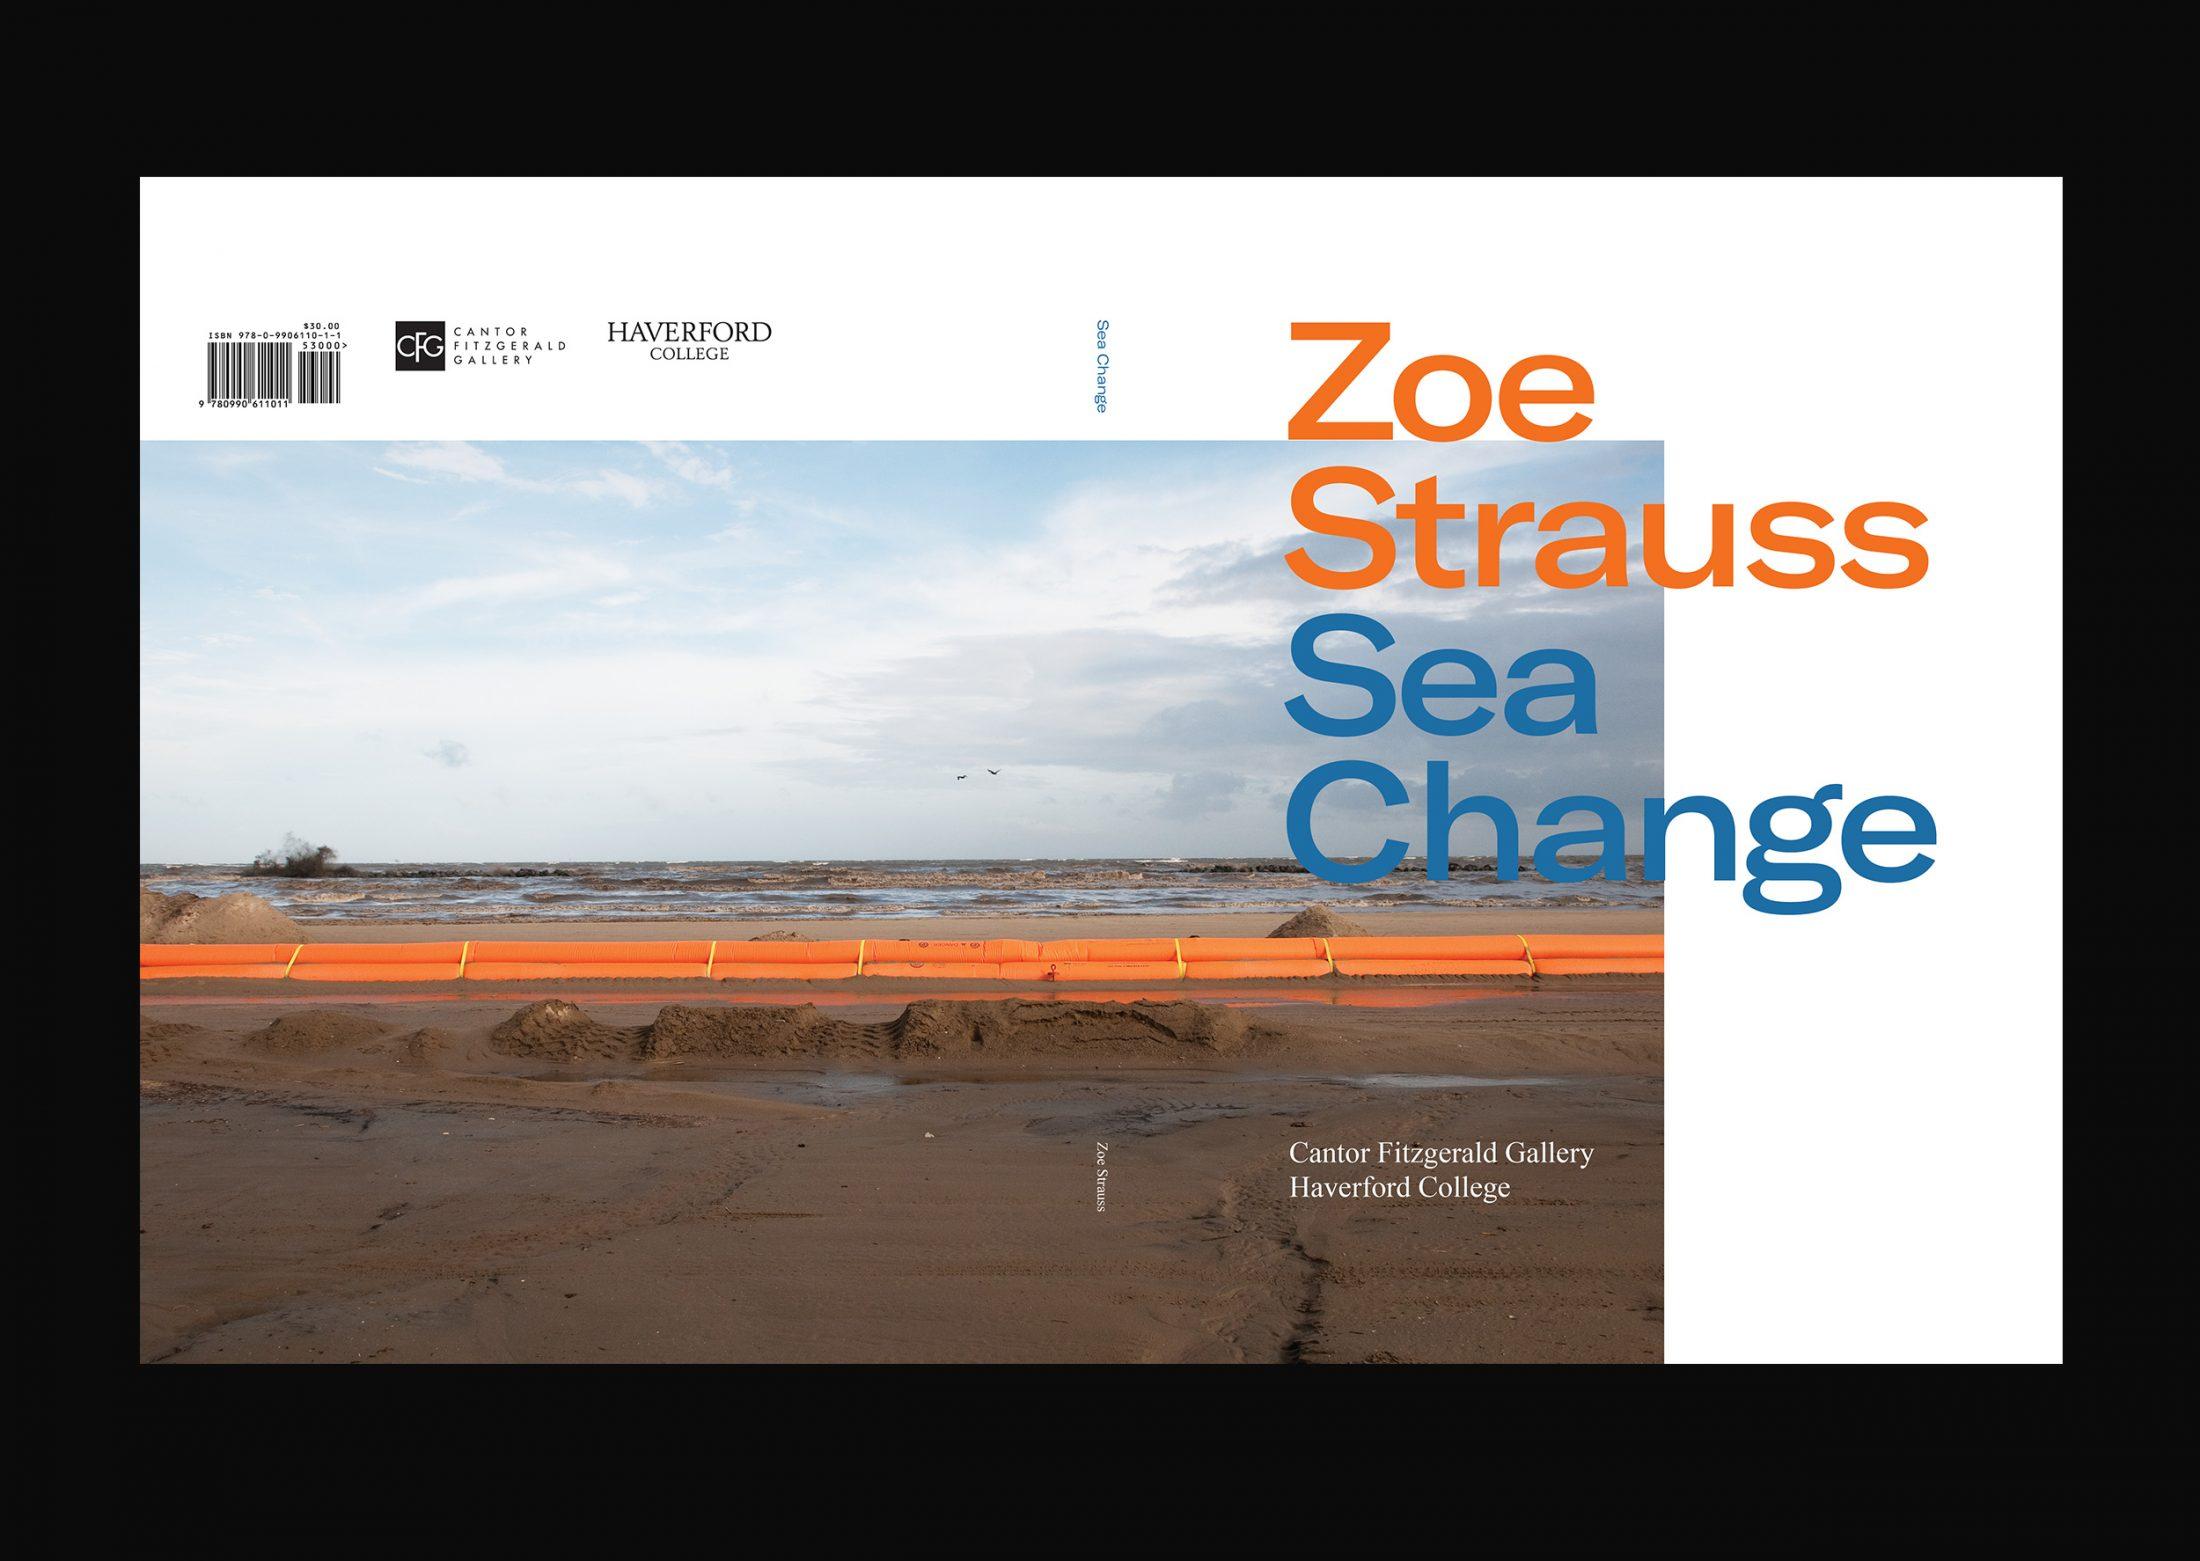 Zoe Strauss